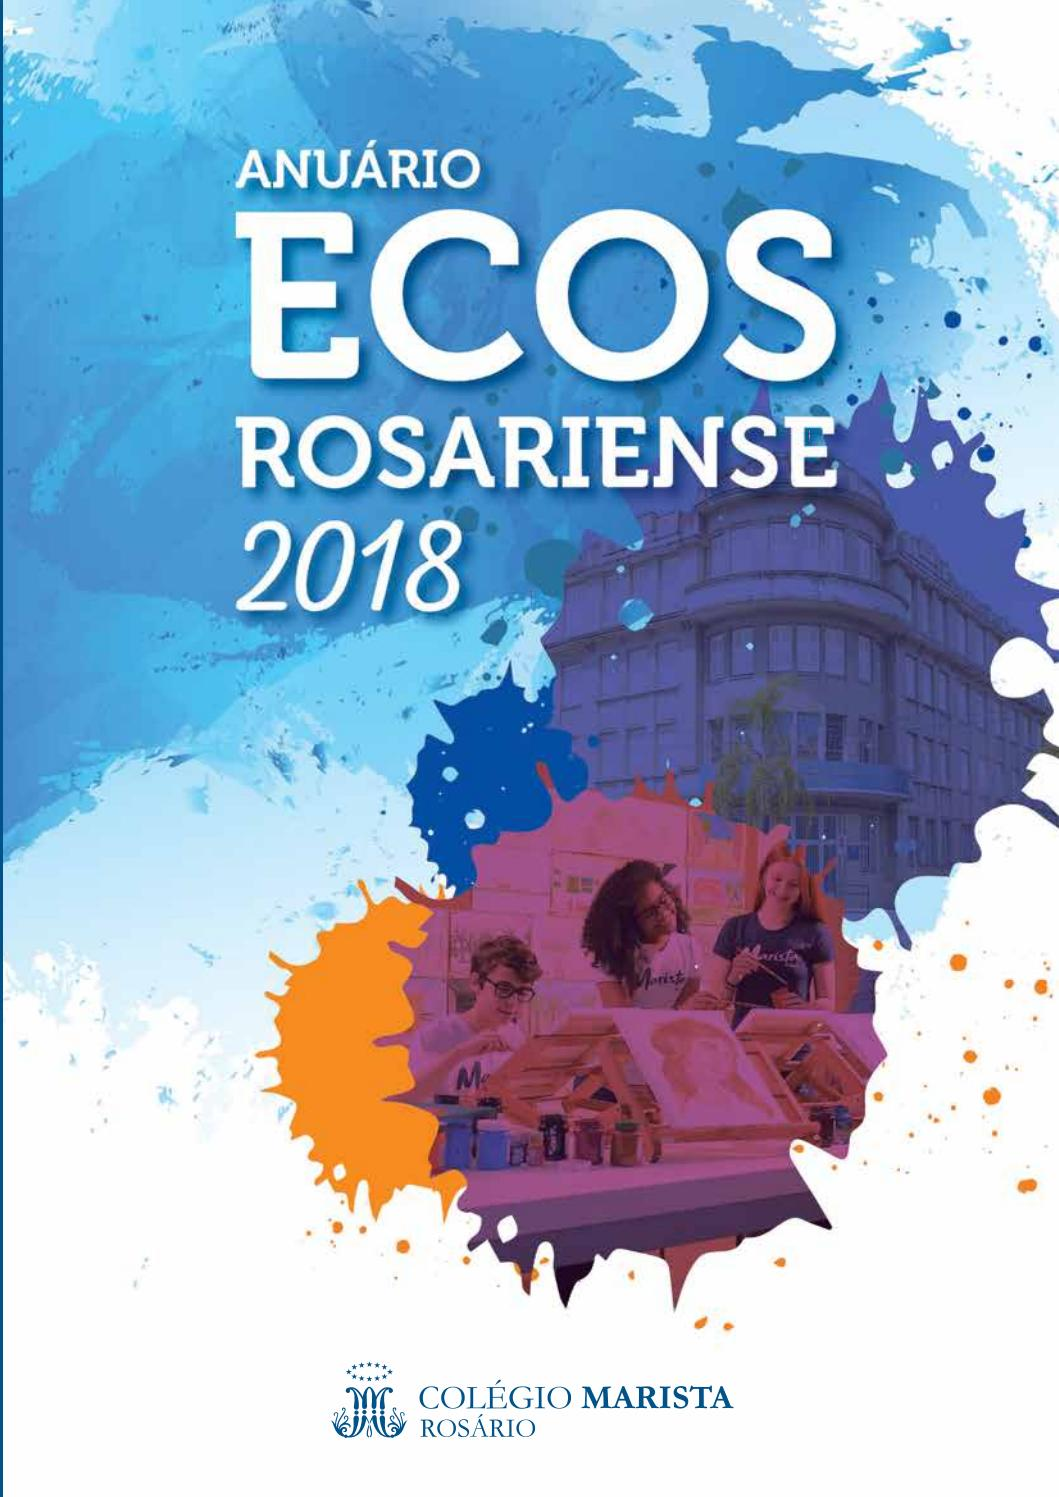 Anuario Ecos 2018 By Colegio Marista Rosario Issuu